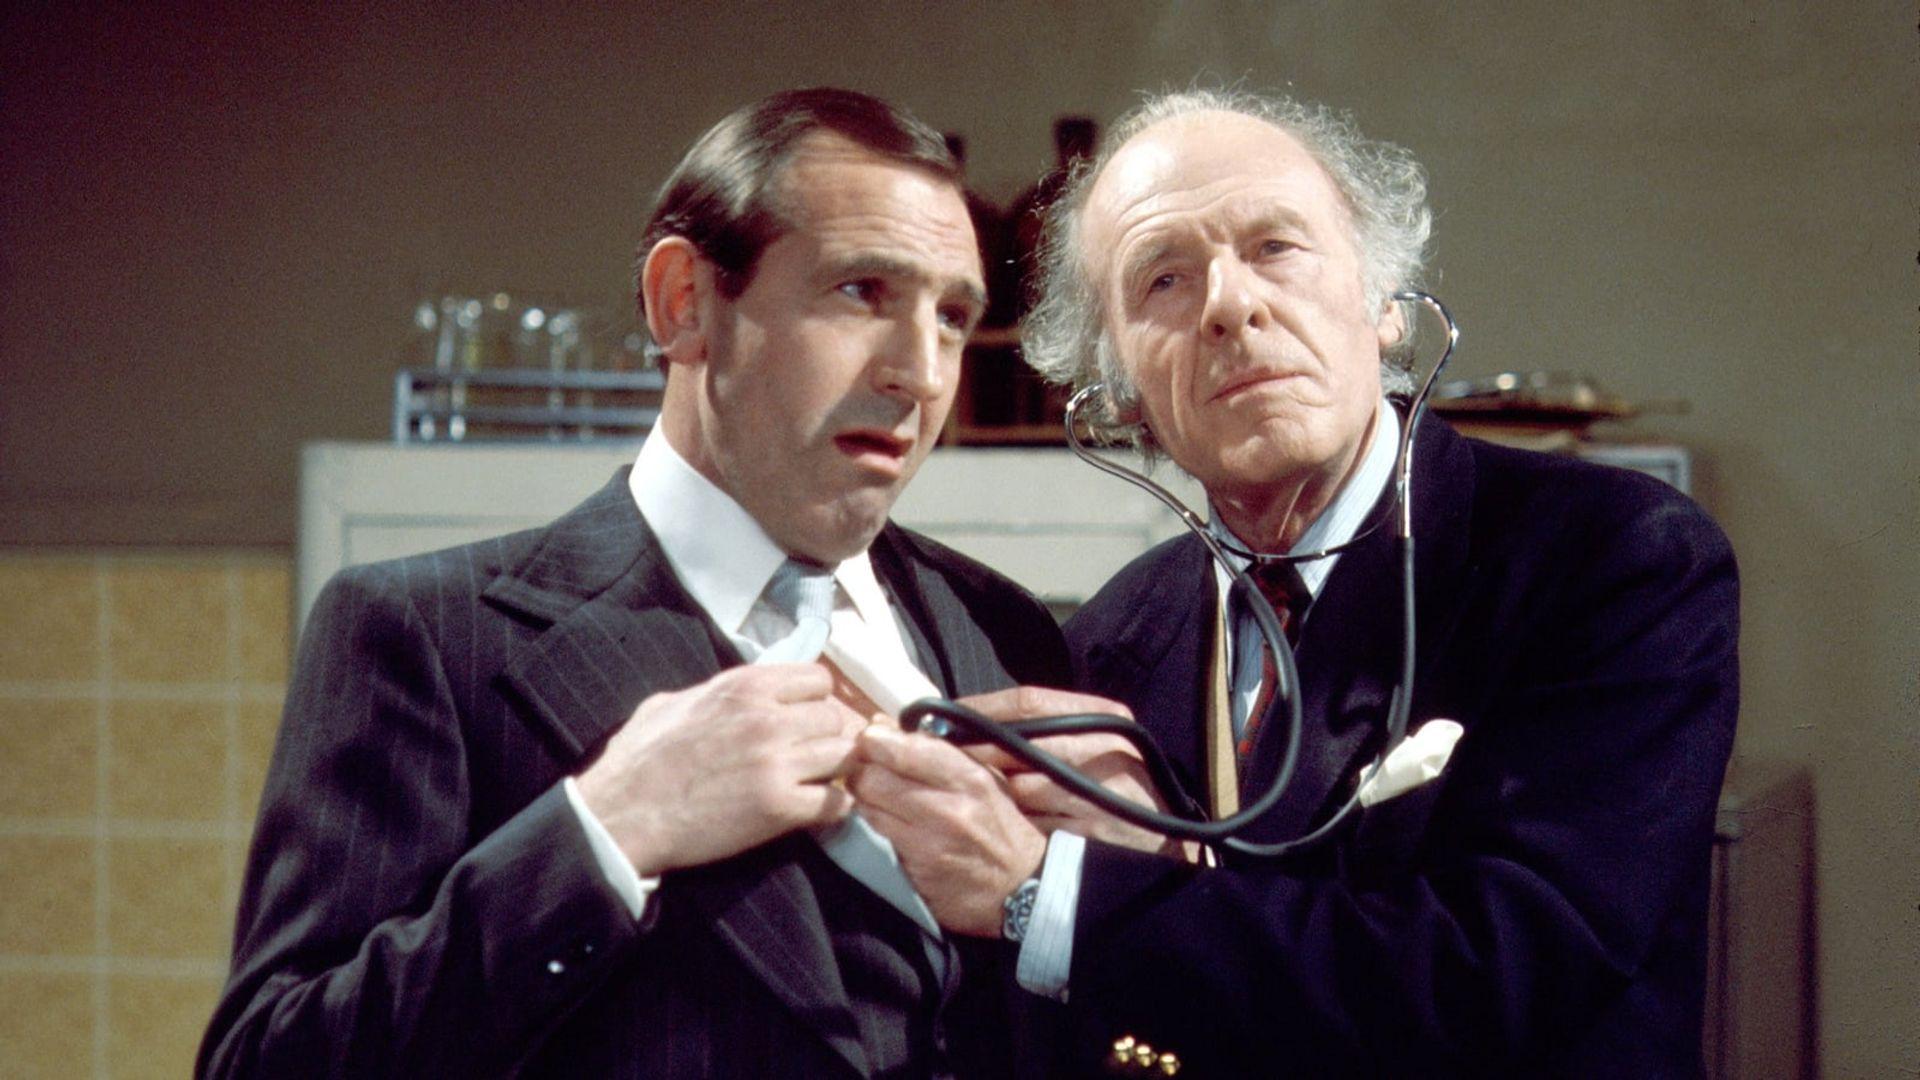 Season 04, Episode 01 Reggie's Will